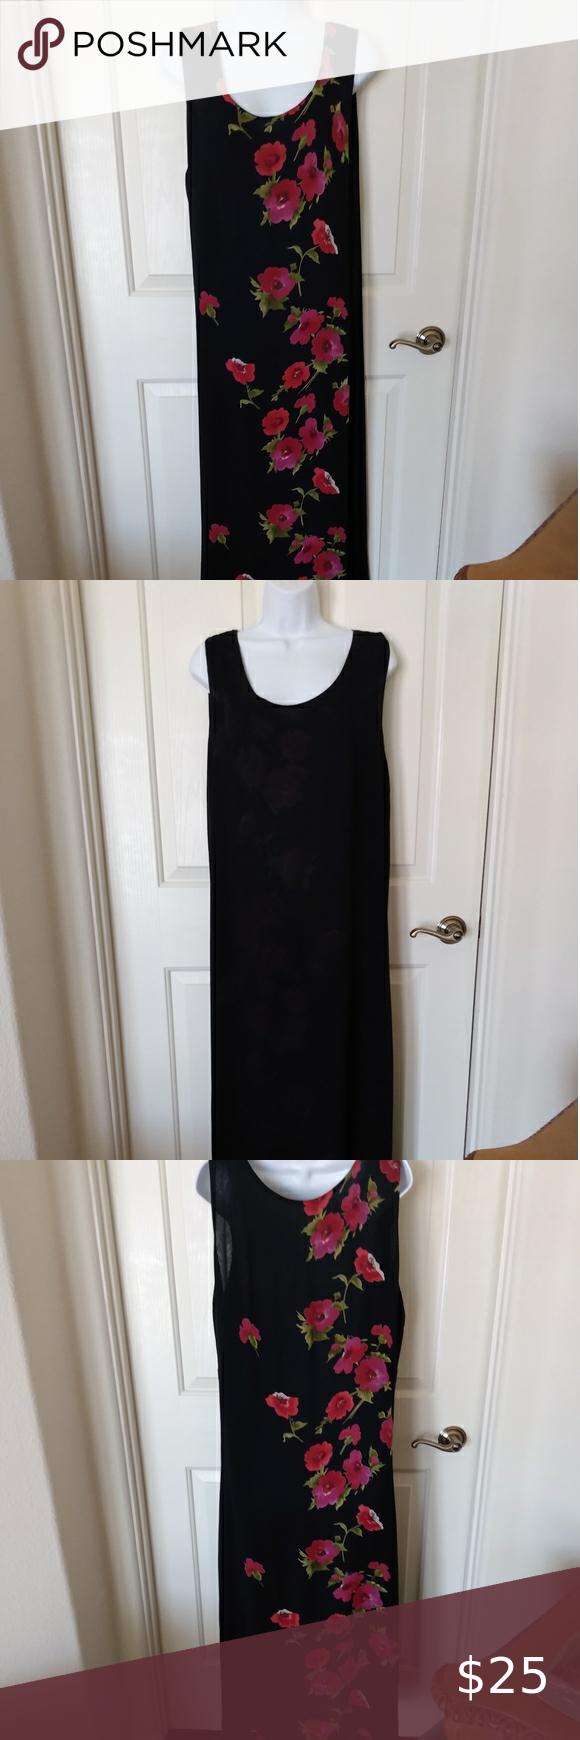 Vintage Boho Nordstrom Xl Reversible Black Dress Clothes Design Vintage Black Dress Vintage Boho [ 1740 x 580 Pixel ]